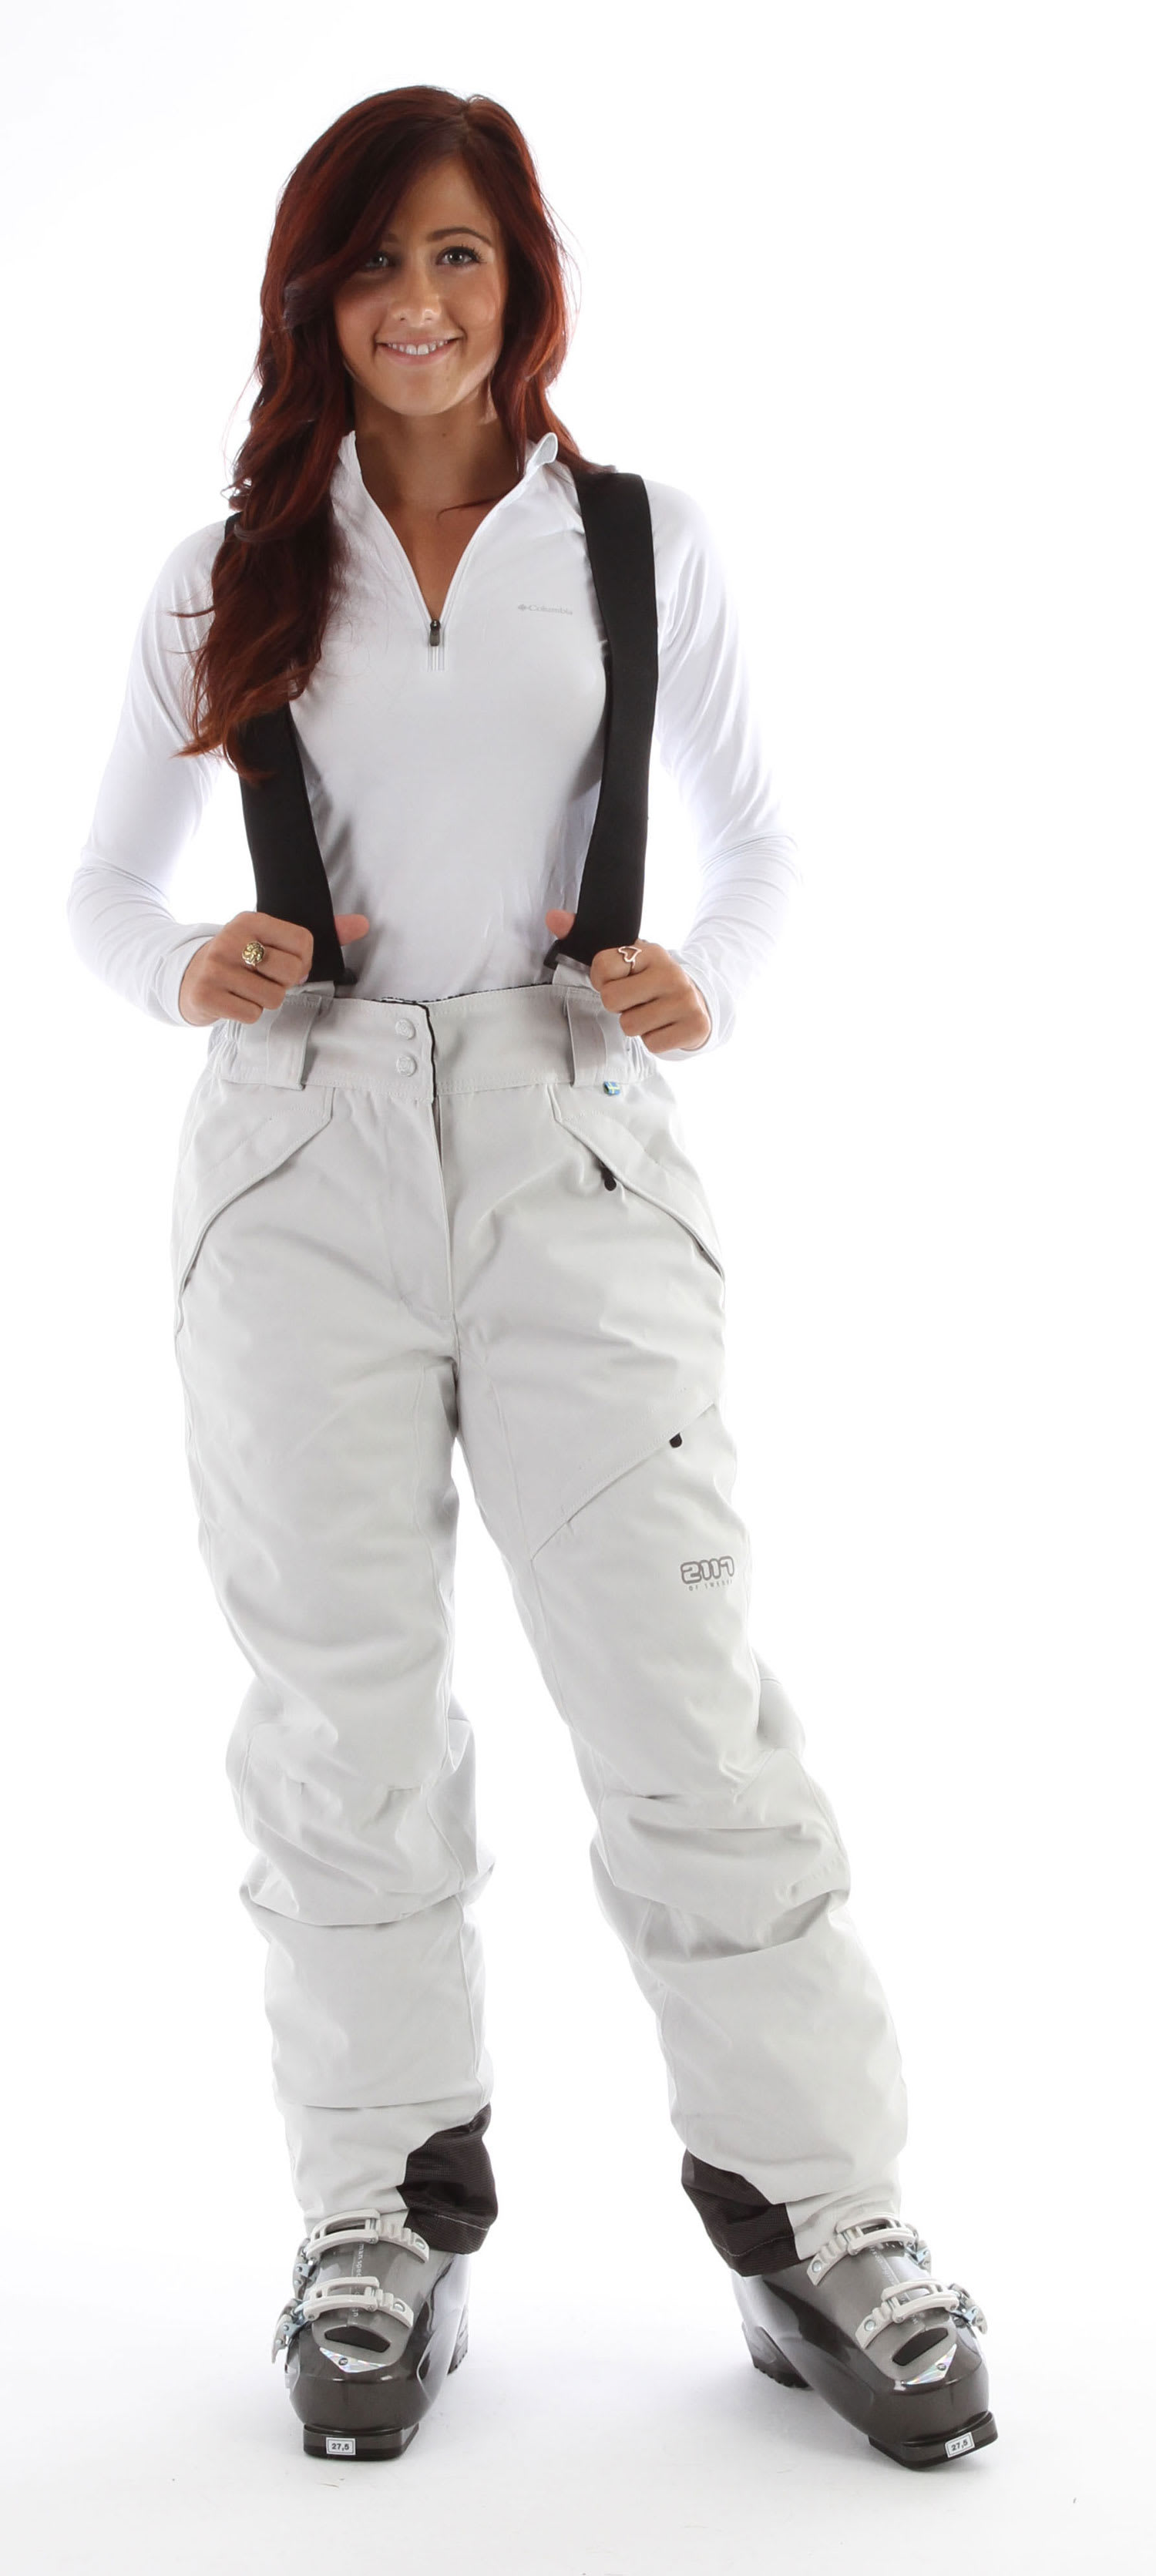 2117 Of Sweden Tallmossen Snowboard Ski Pants Womens